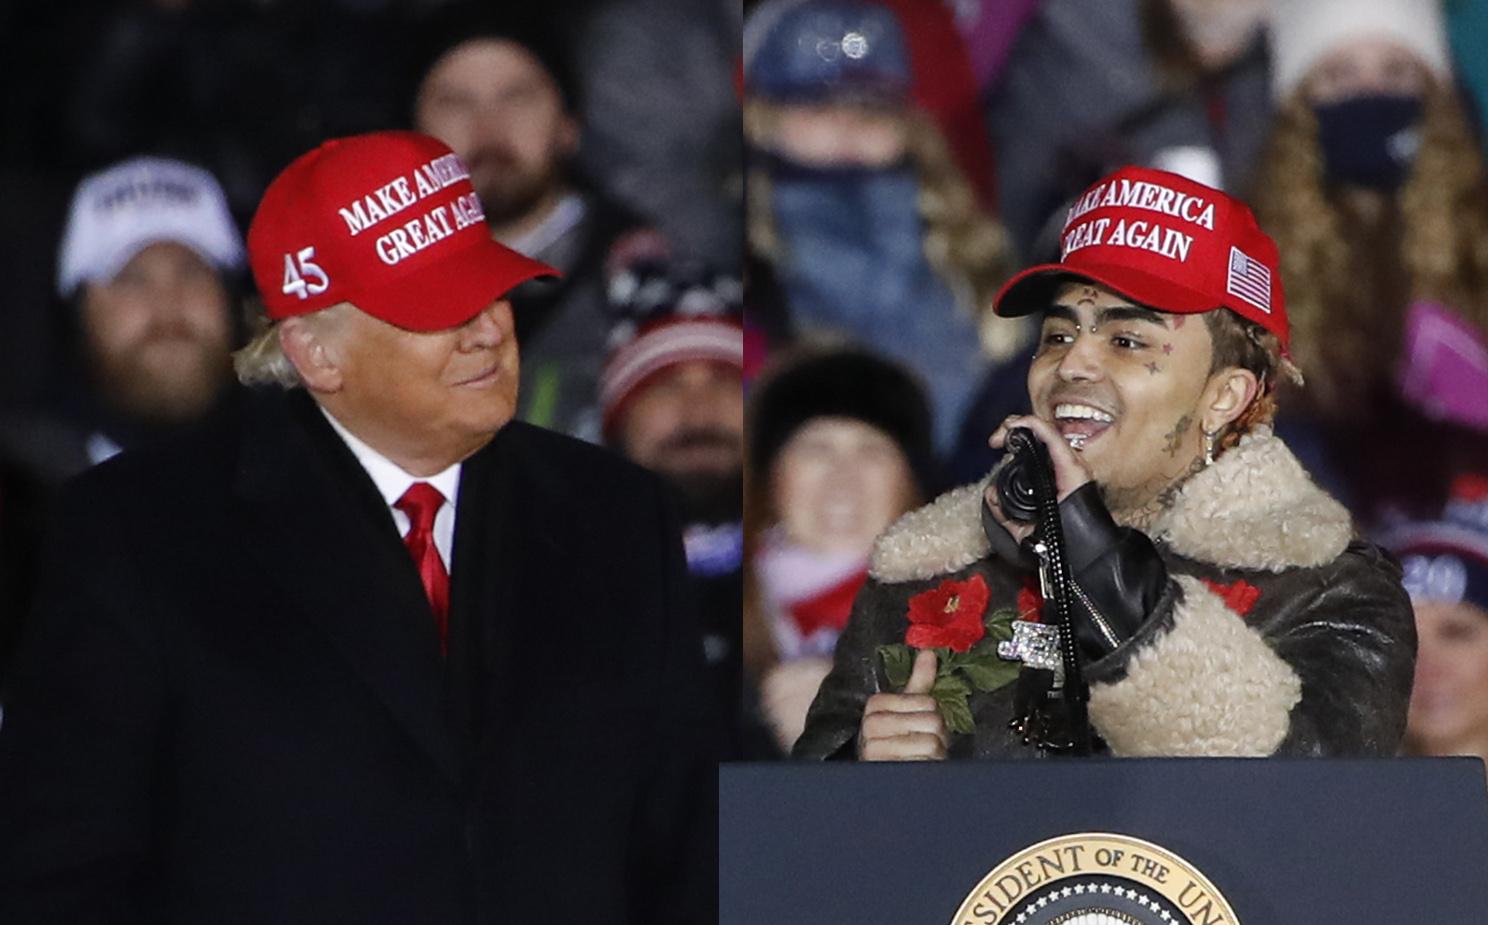 Lil Pump holder tale ved siden av Donald Trump på stevnet i Grand Rapids i Michigan 3. november 2020 (Kamil Krzaczynski/Getty)